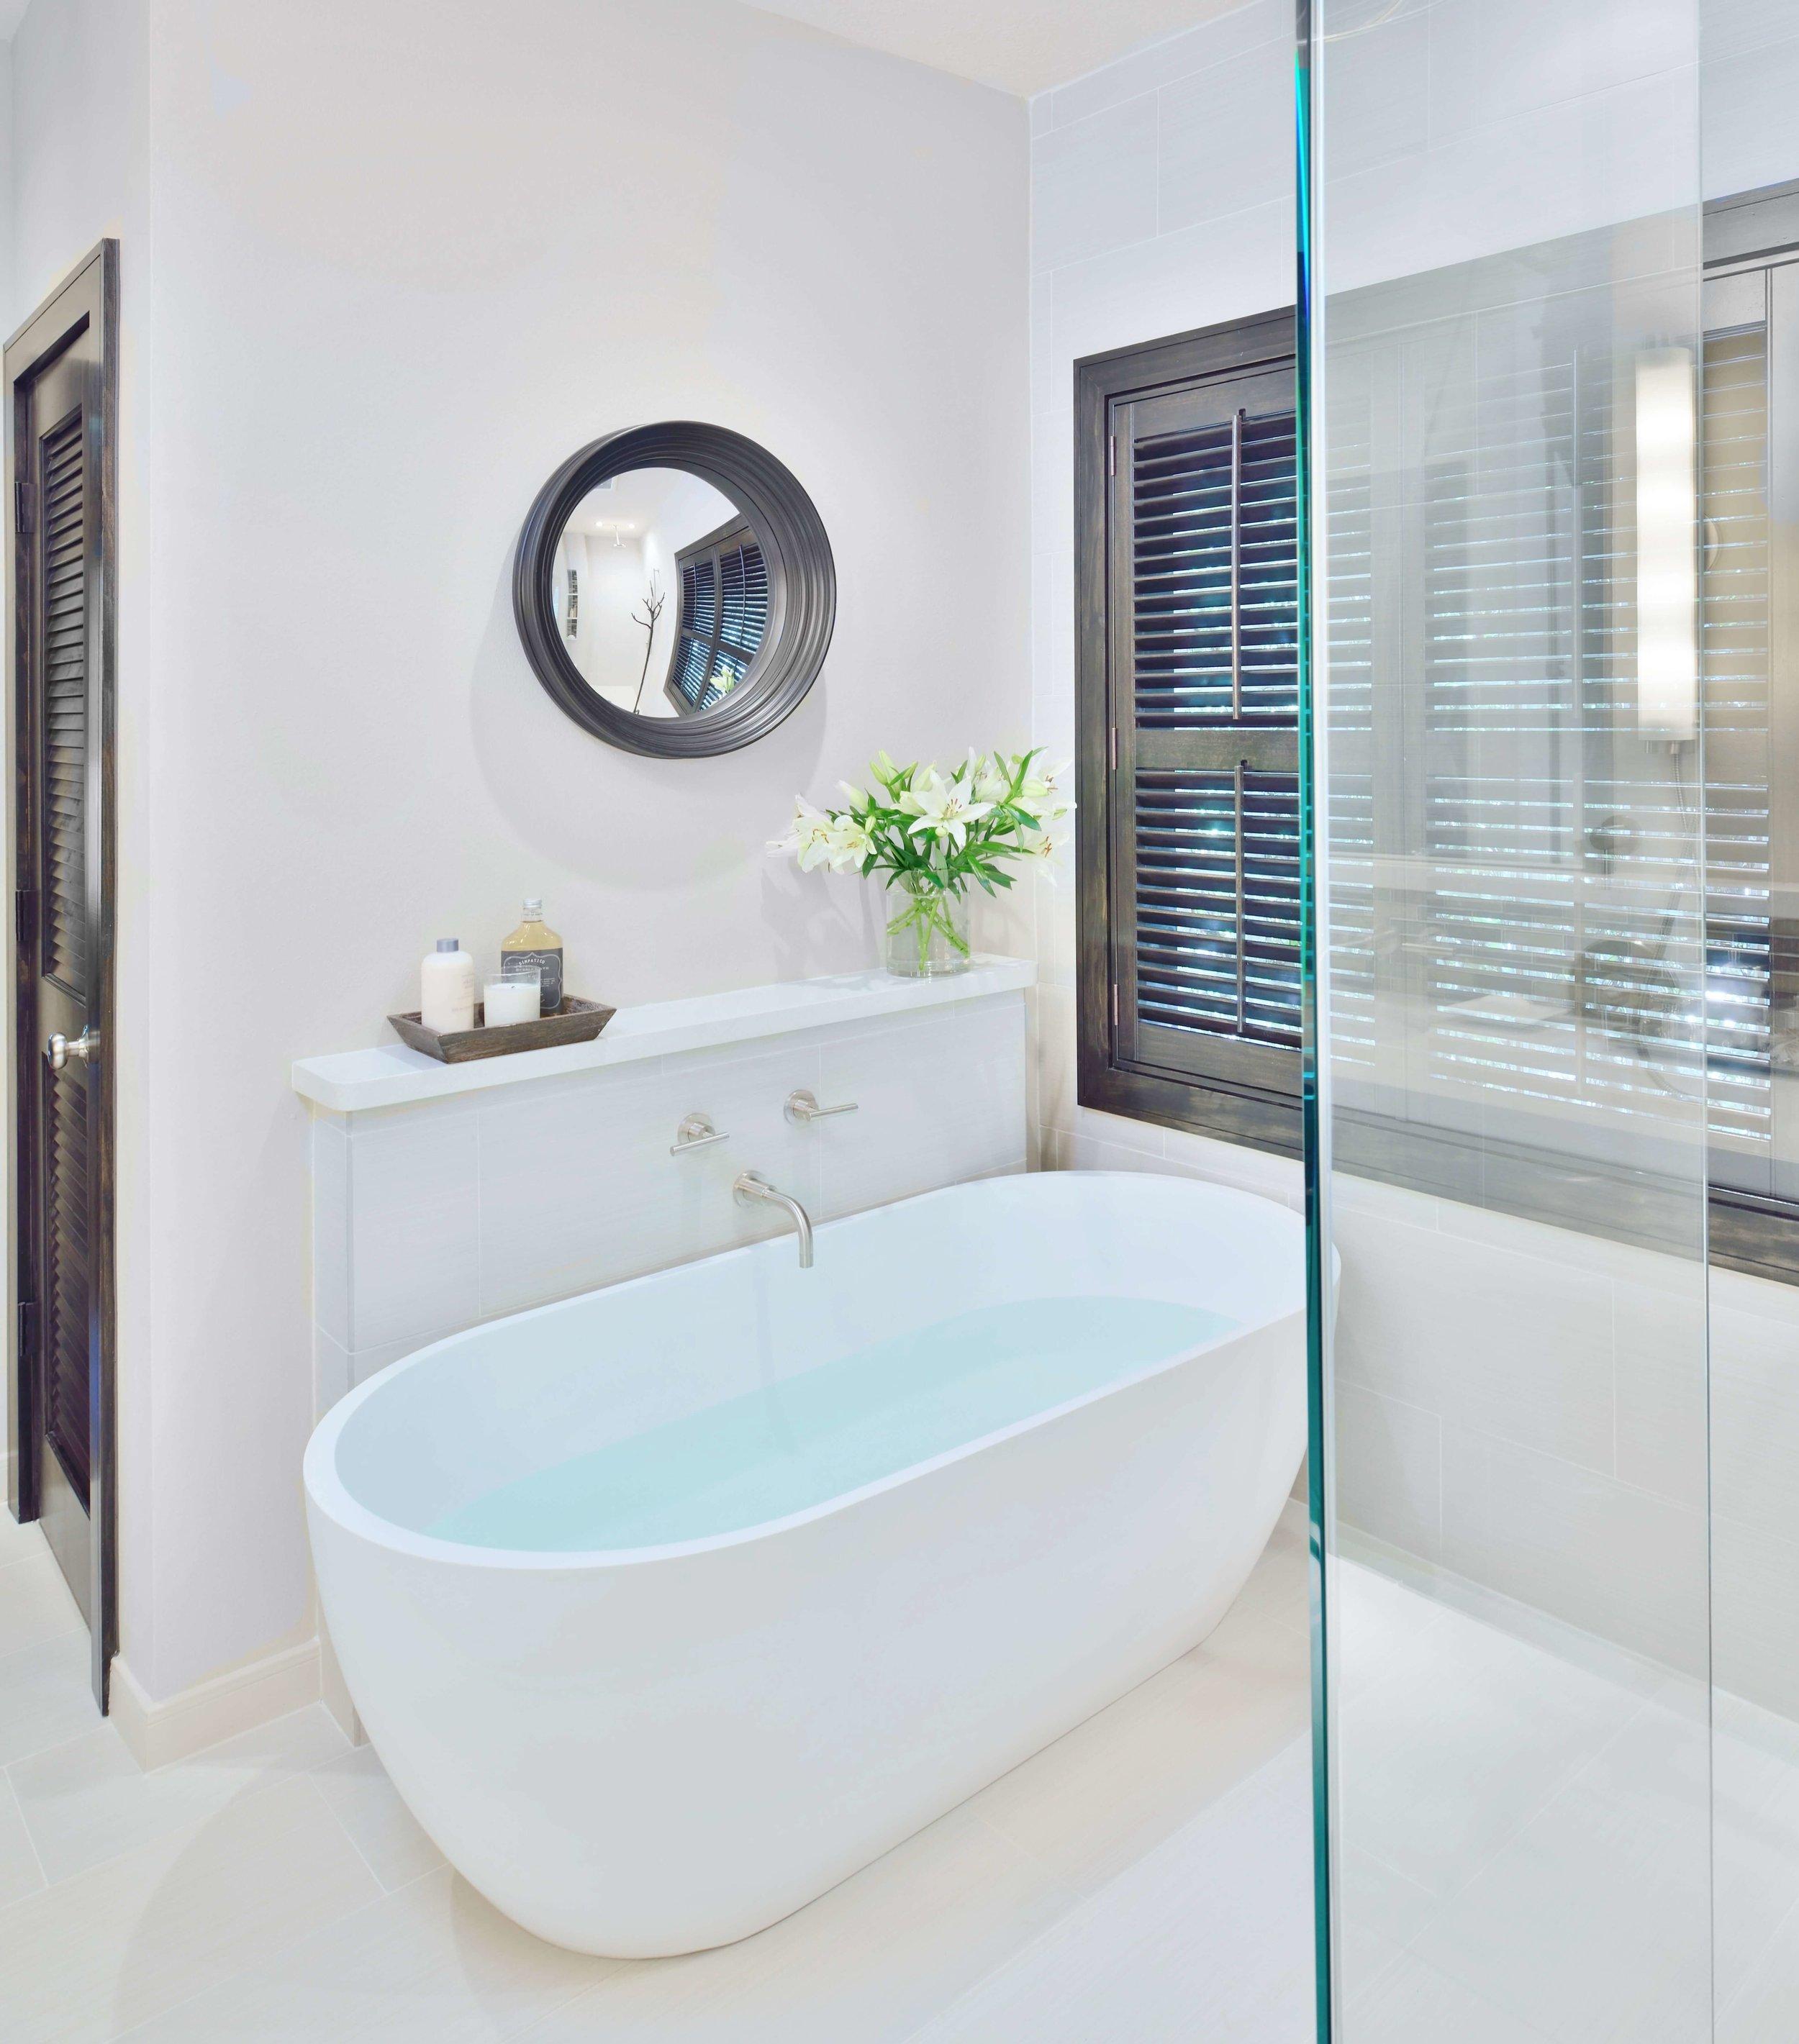 Free standing tub with ledge | Carla Aston, Designer | Miro Dvorscak, Photo | #freestandingtub #tub #bathroomdesign